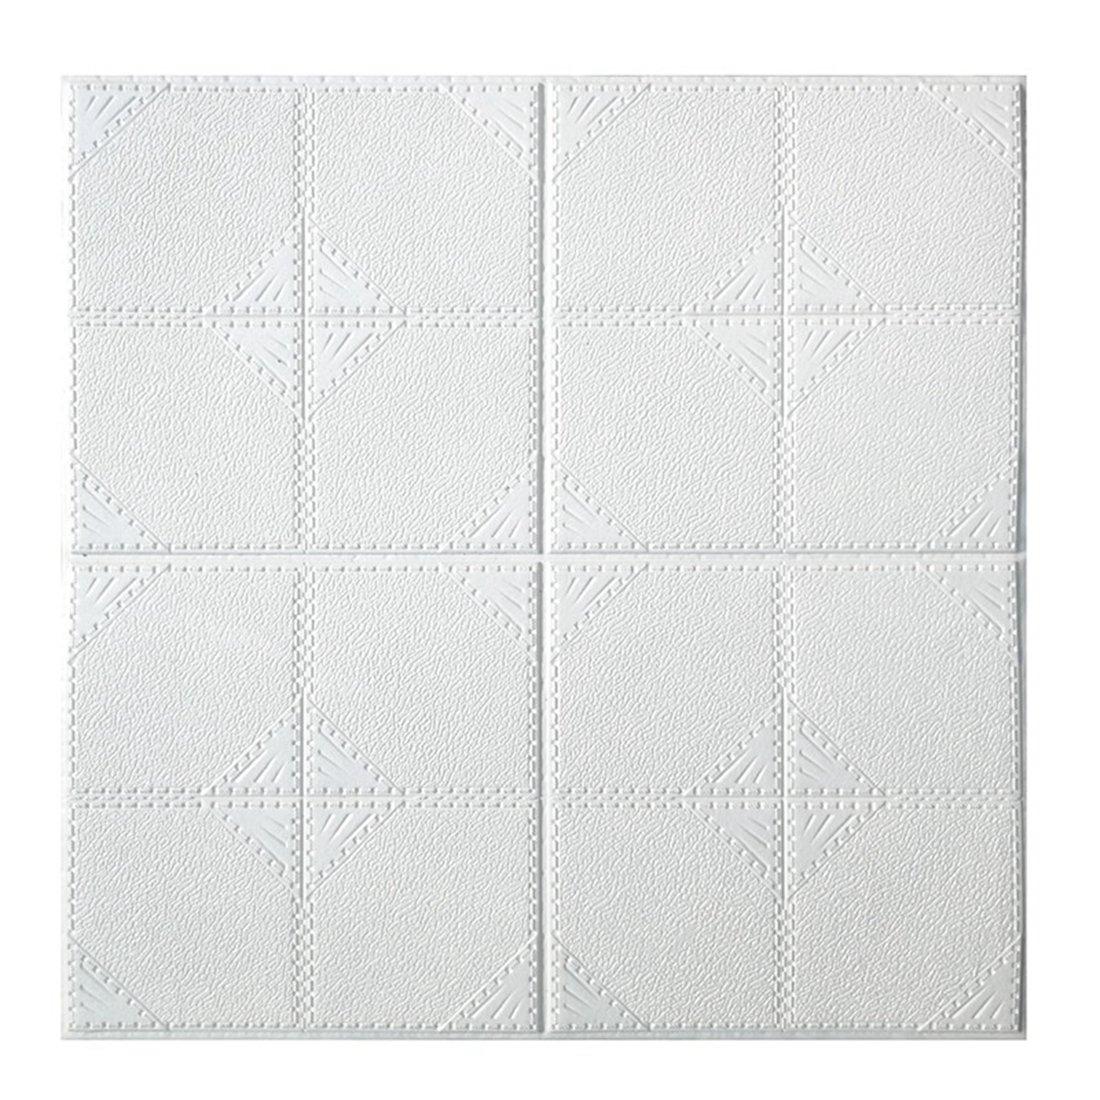 (Enerhu)3D壁紙パネル 3Dウォールステッカー DIY クッションブリック 壁紙シール 防水 防音 断熱 3D 自己粘着 装飾 軽量 発泡 おしゃれ インテリア リビング 子供部屋 多色選択 60*60cm 30枚入り ホワイト B07DS7Z4NV 60*60cm(30枚入り) ホワイト